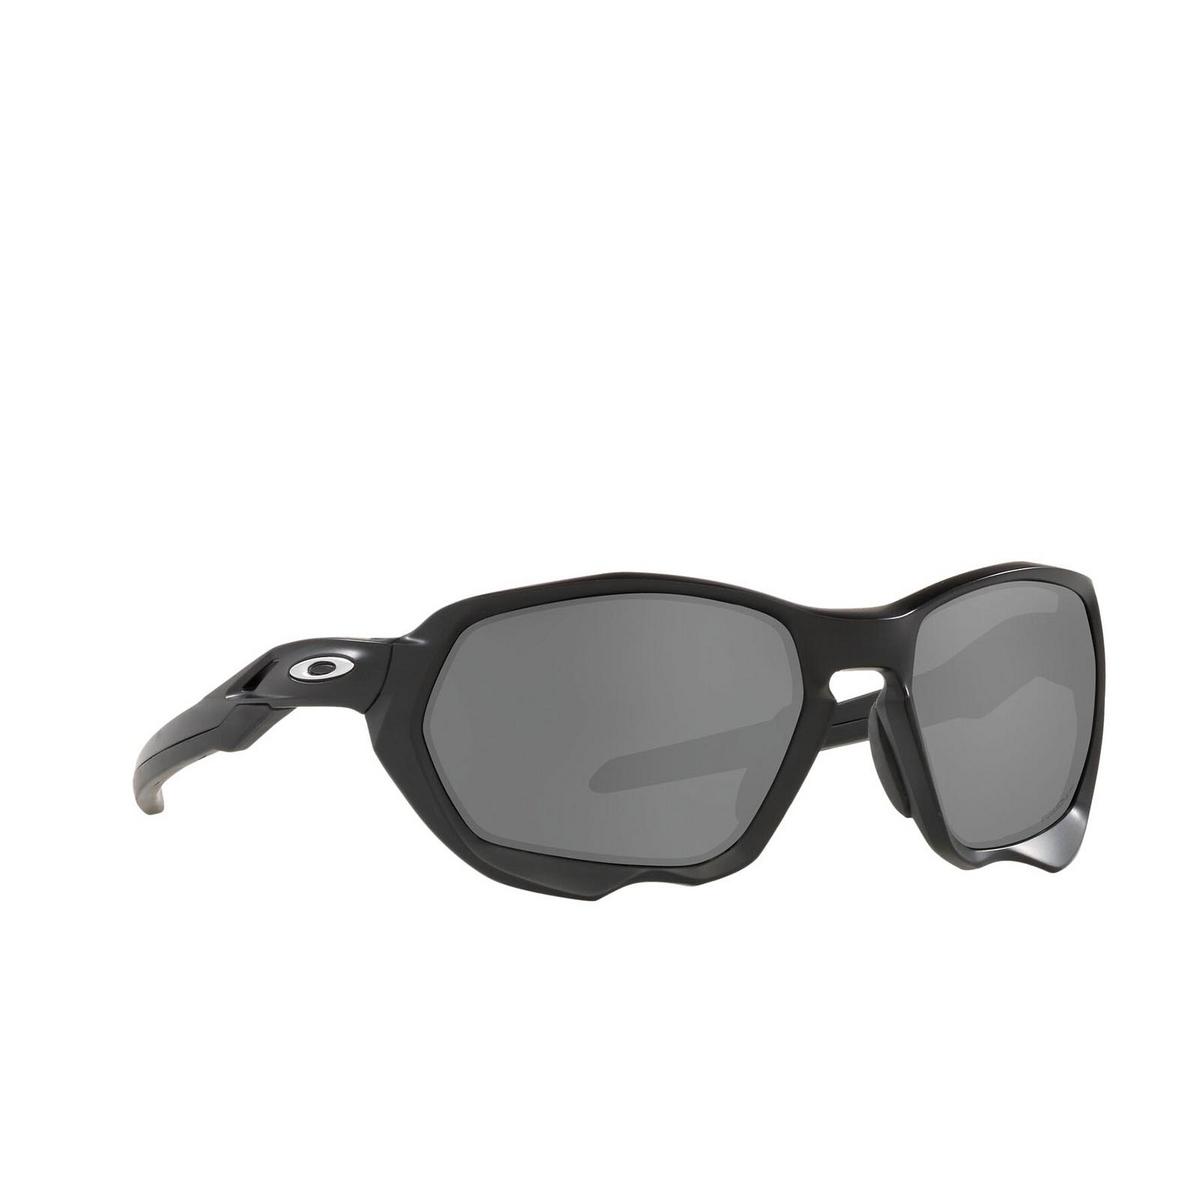 Oakley® Sport Sunglasses: Plazma OO9019 color Matte Black 901906 - three-quarters view.